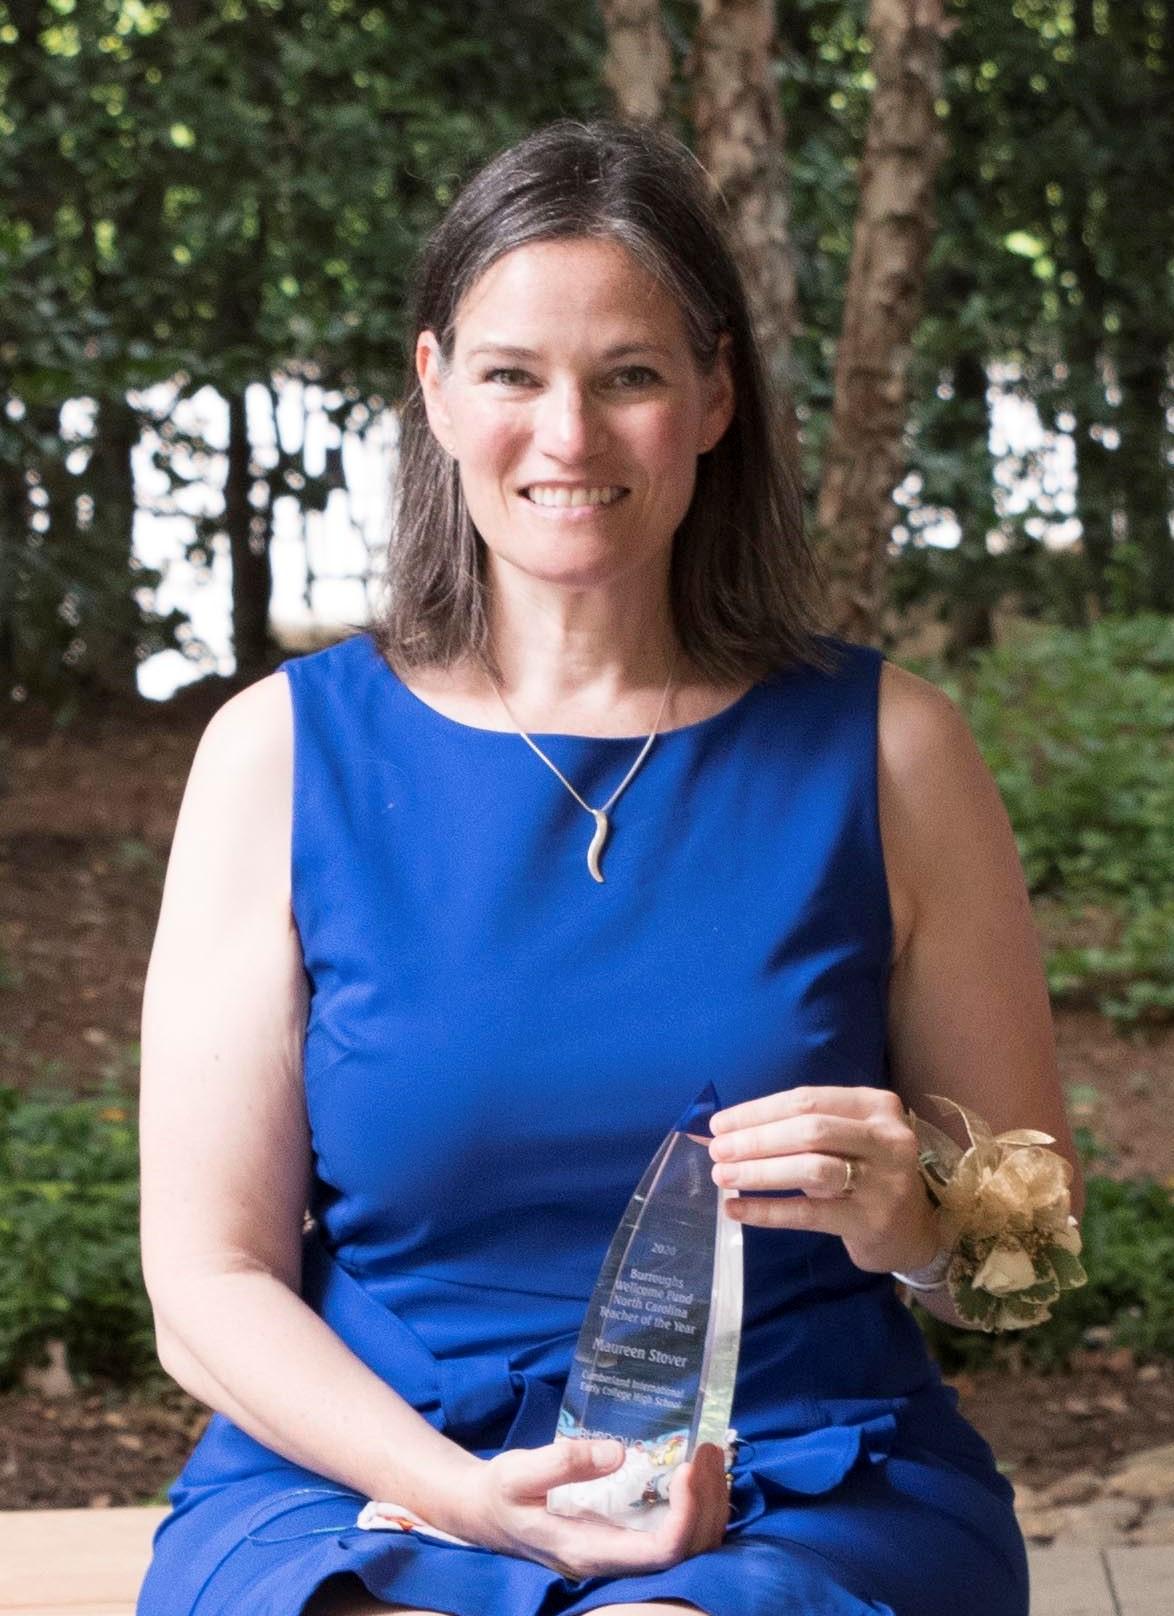 2020 North Carolina Teacher of the Year Maureen Stover